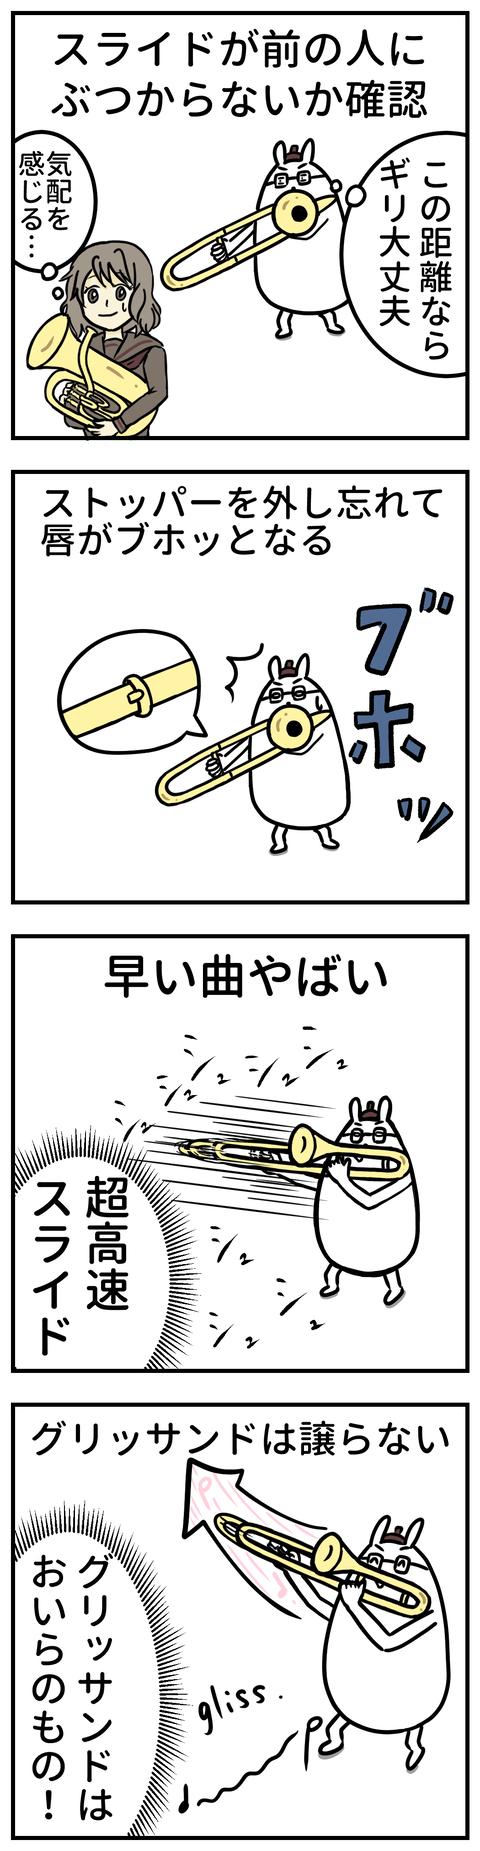 manga-yuzuporo89-1